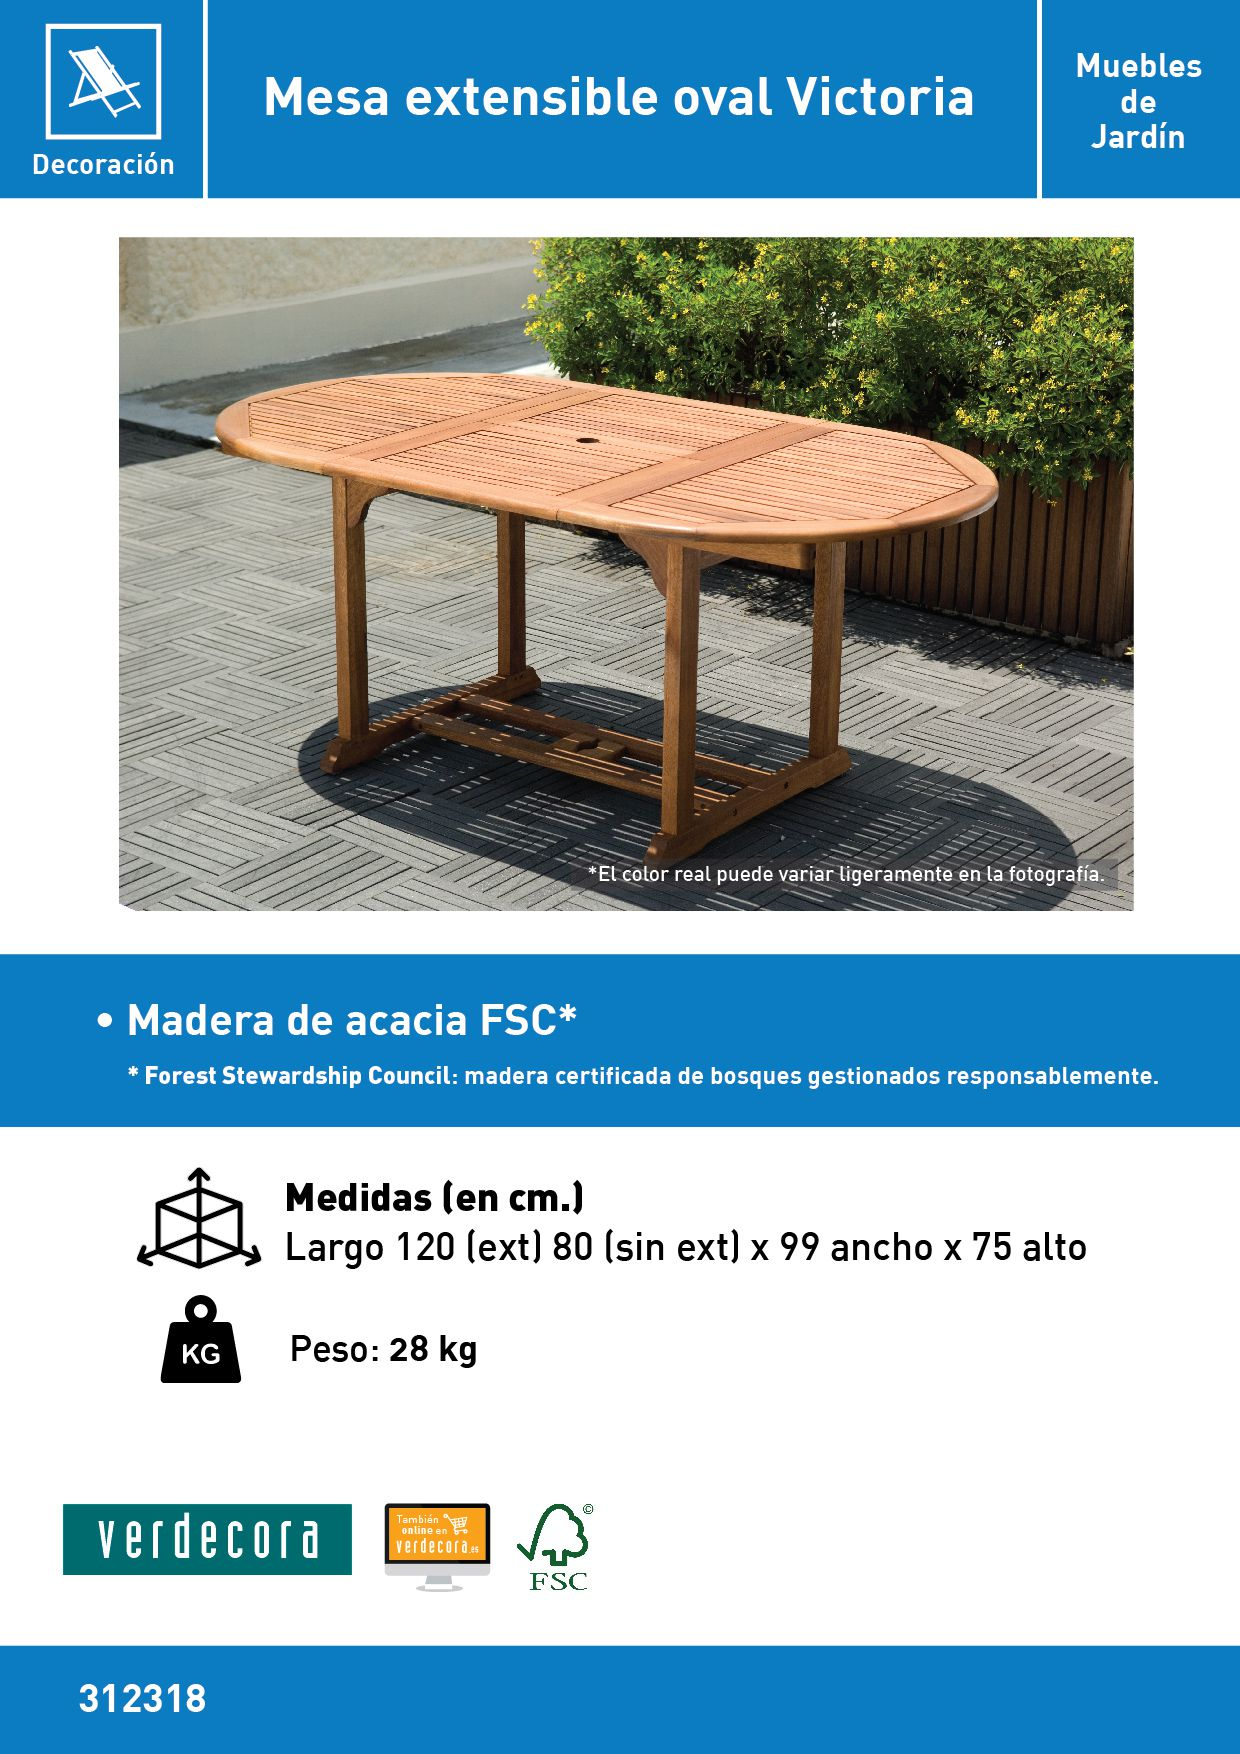 Mesa Extensible Oval Victoria Verdecora # Muebles Riego De La Vega